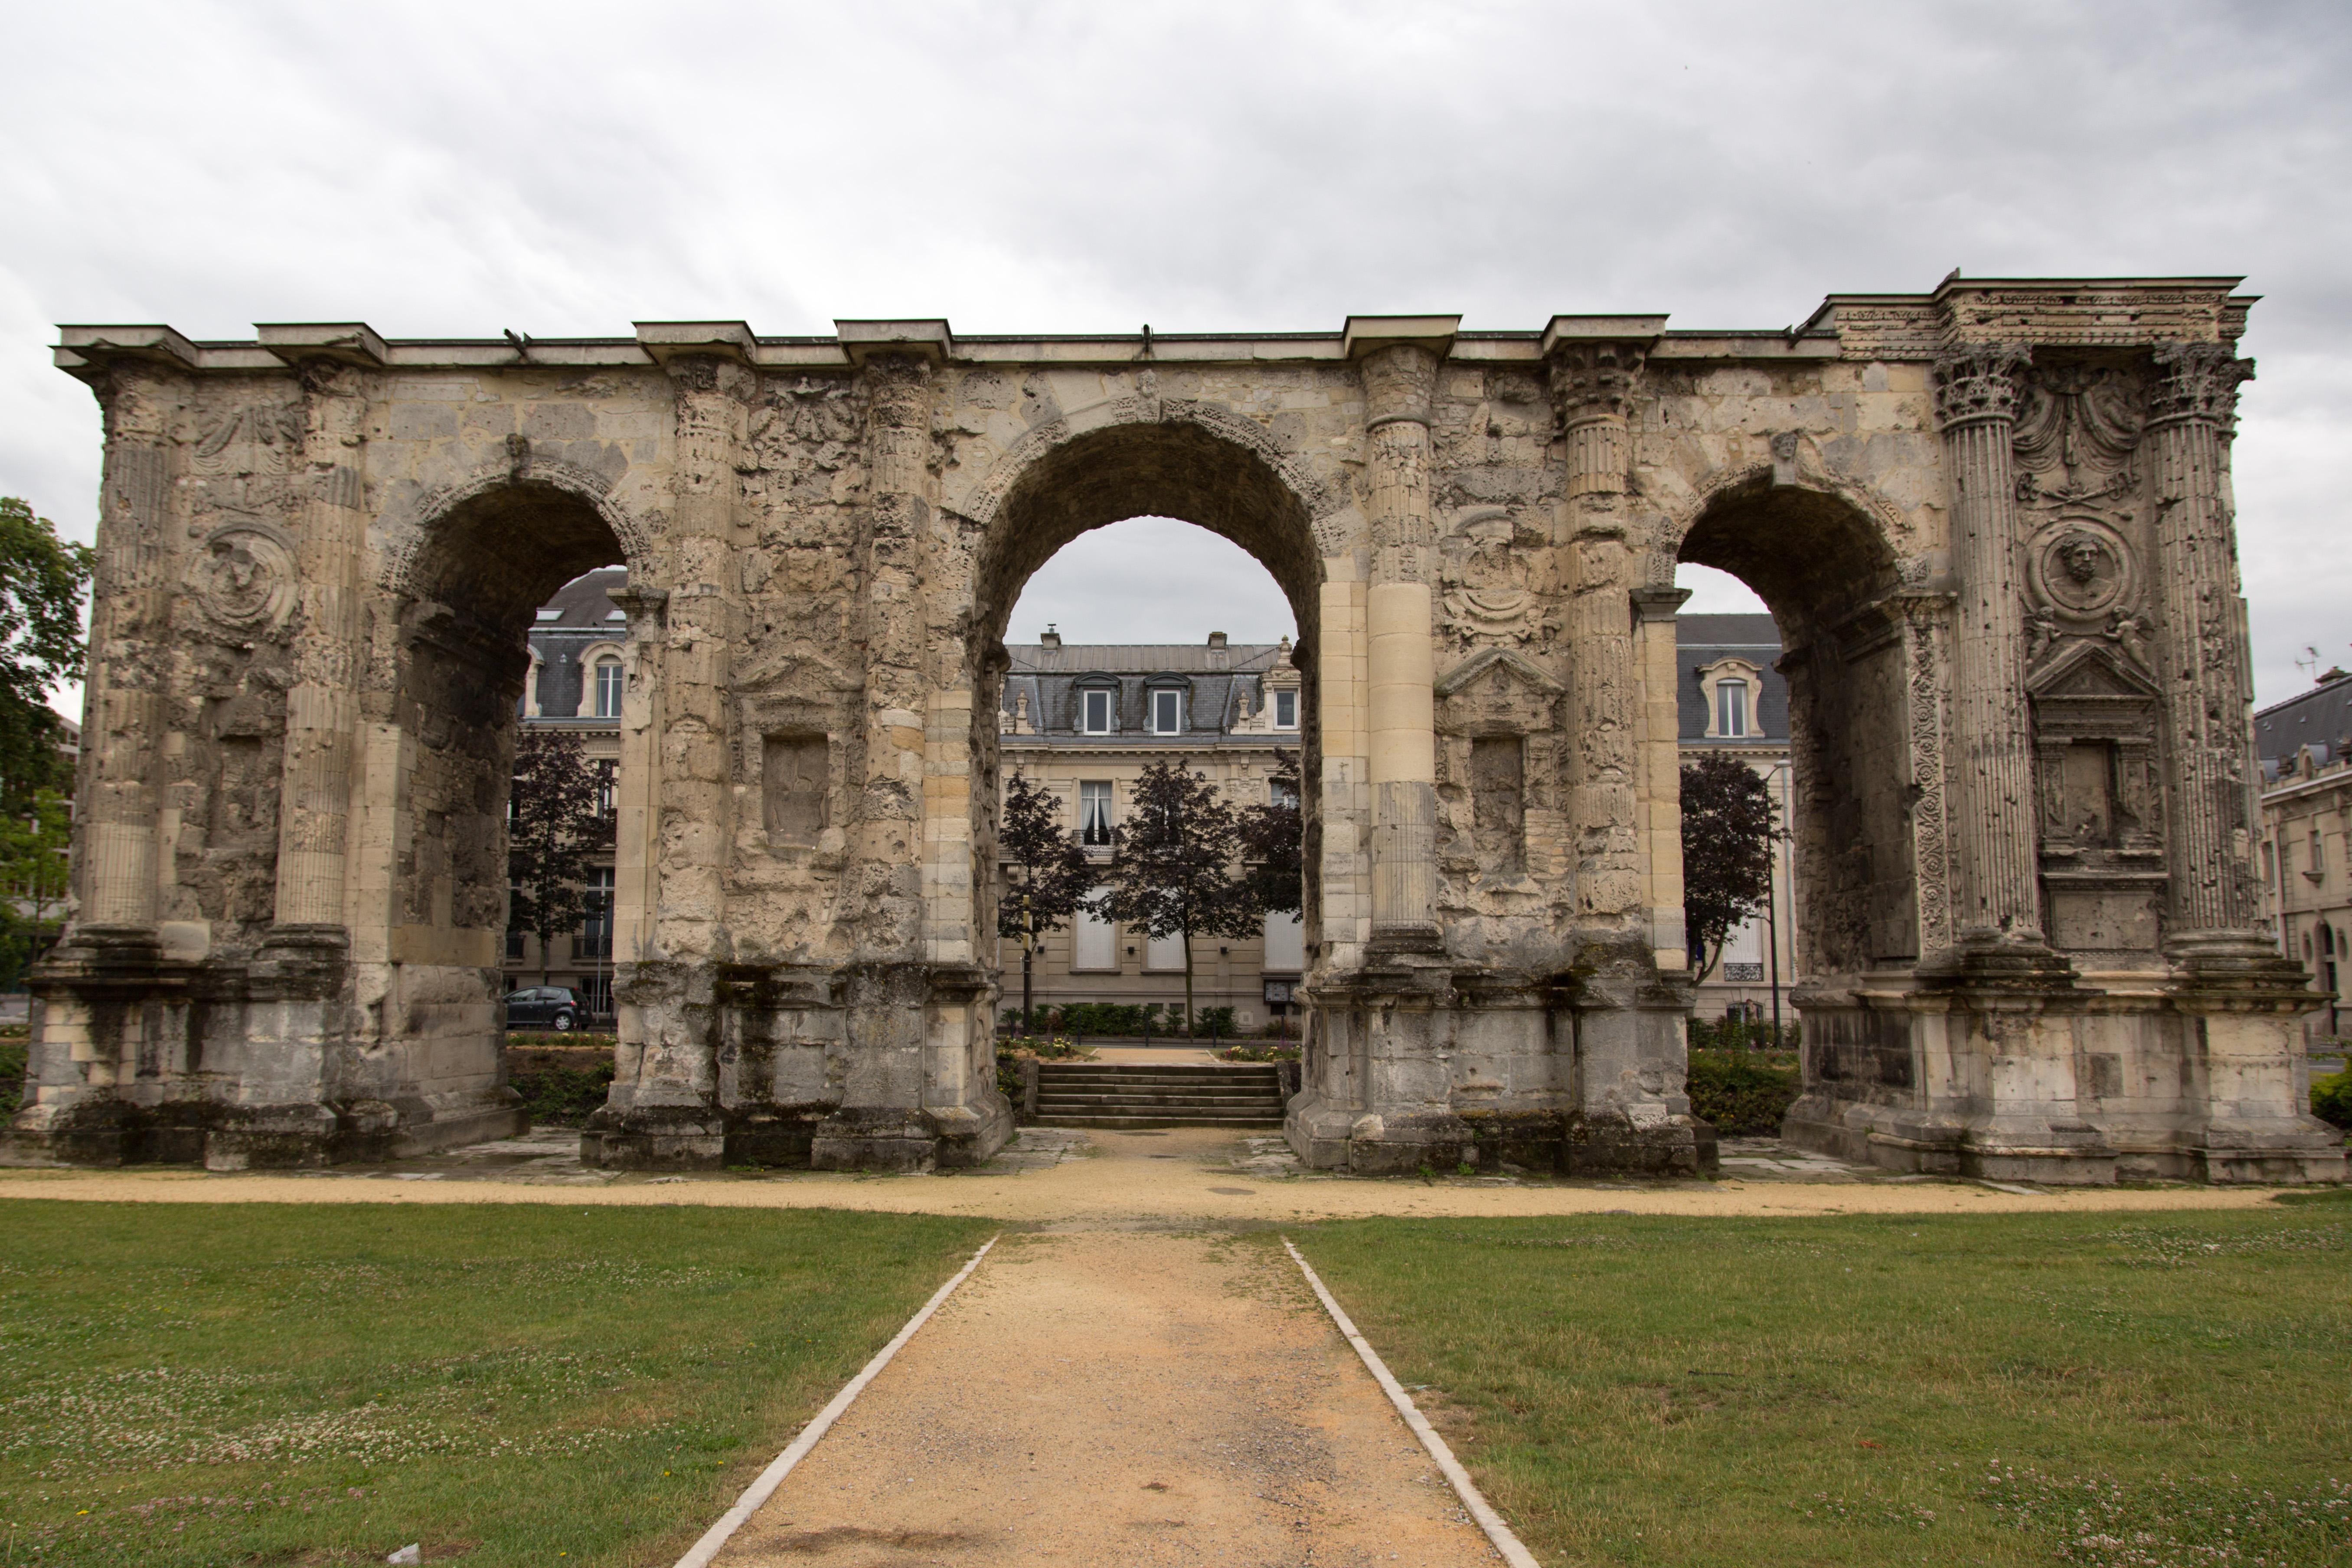 La porte de Mars Porte_Mars_Arch%2C_Reims%2C_France_01